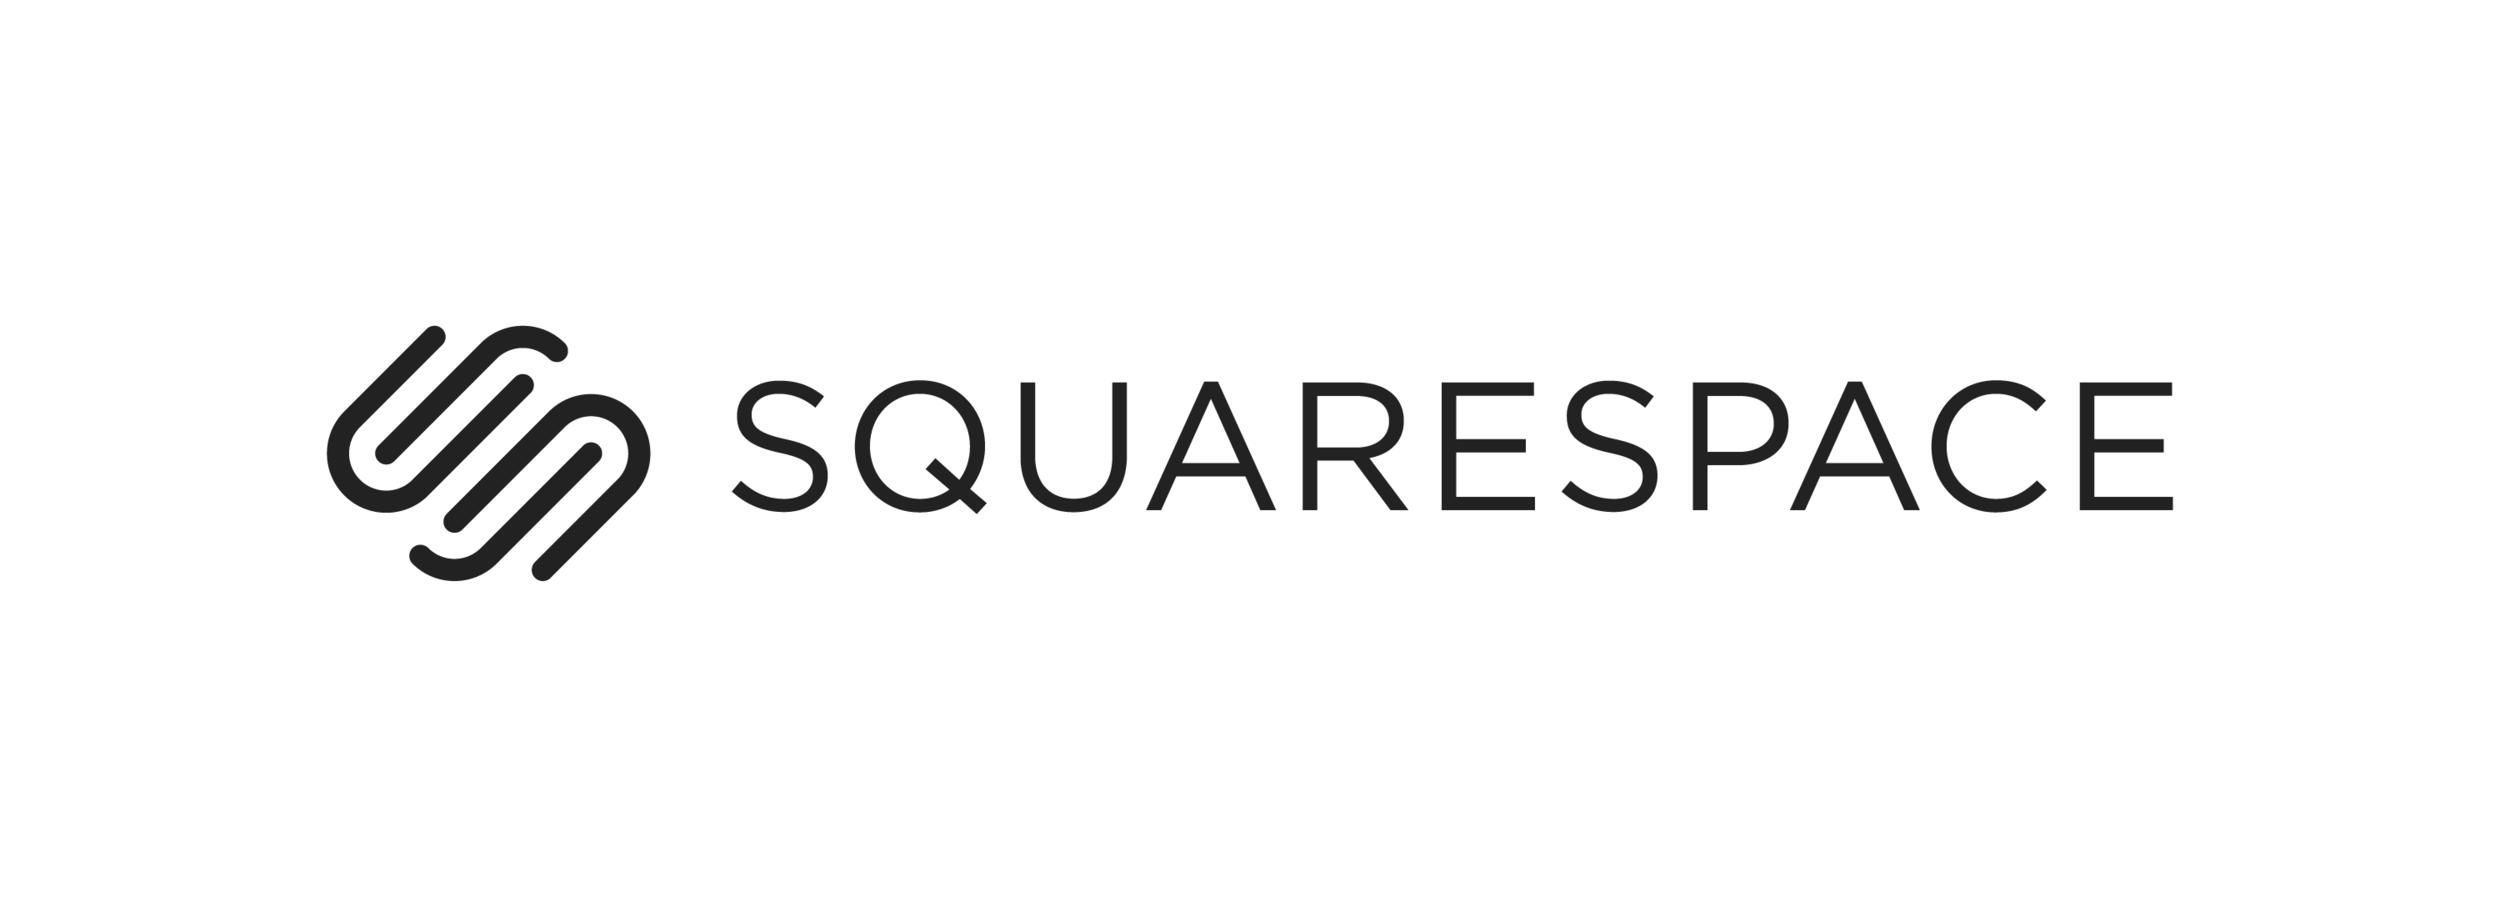 squarespace-sydney-sidecar-web-design.png